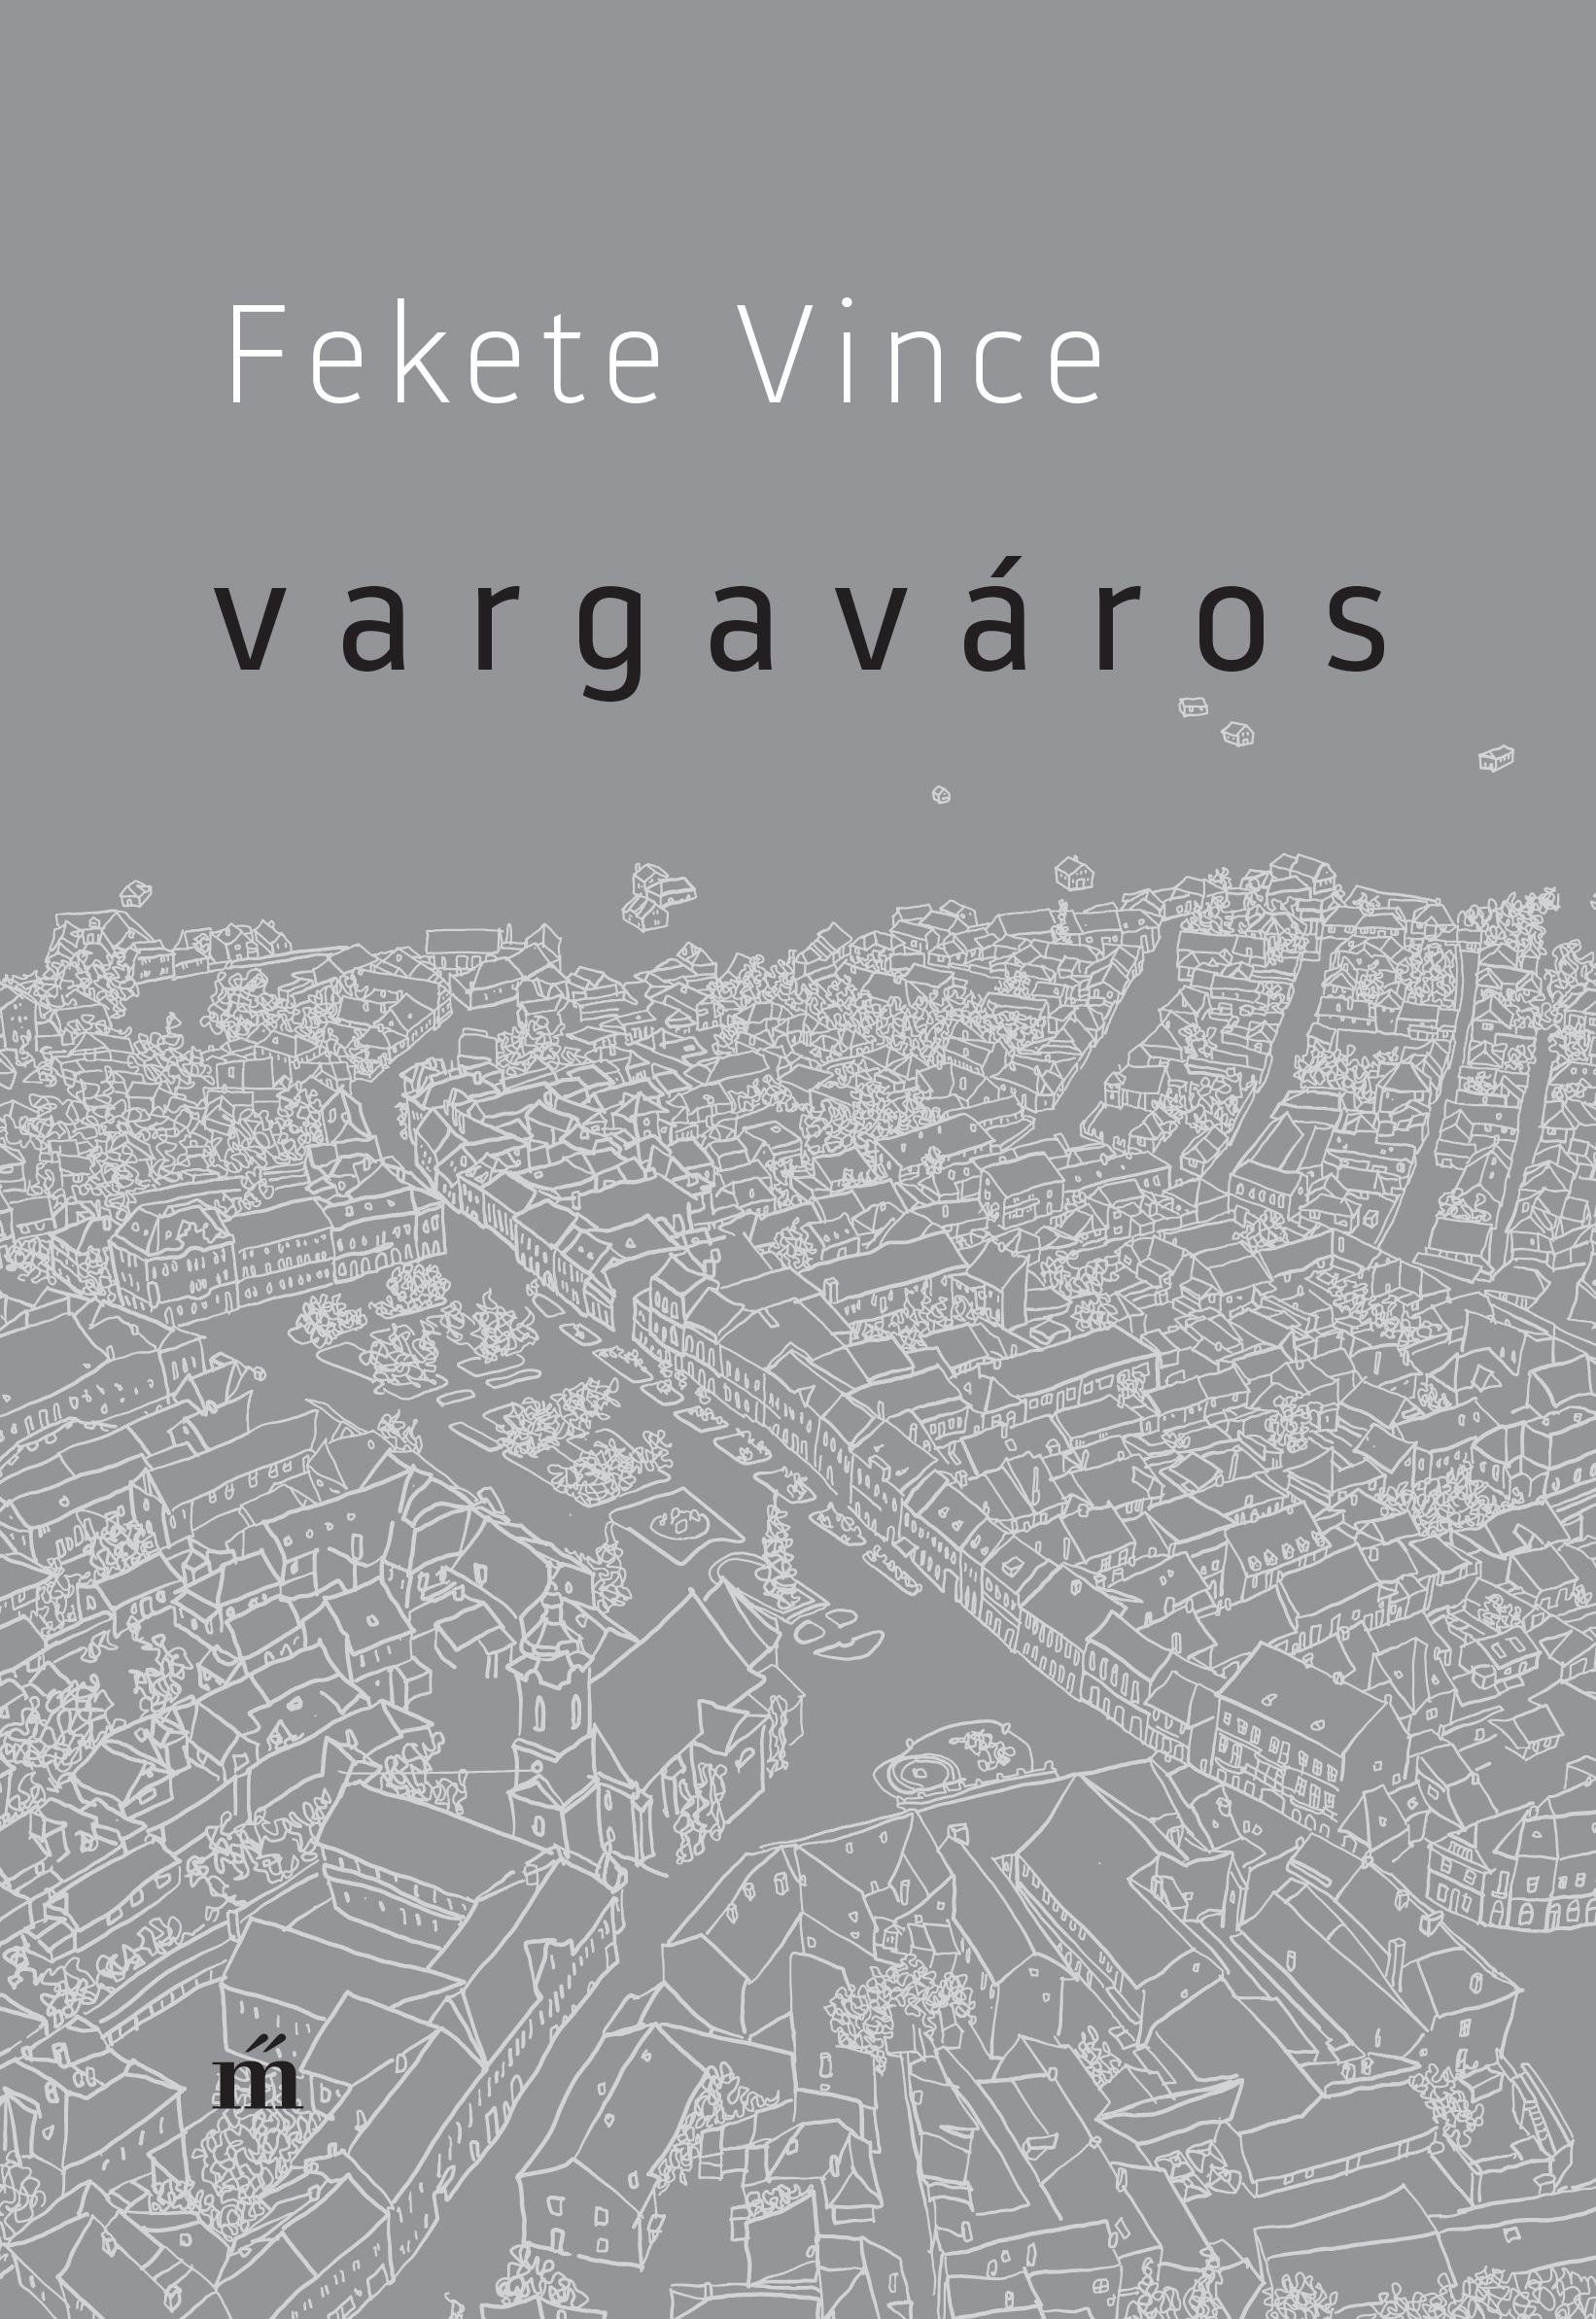 Fekete Vince - Vargaváros